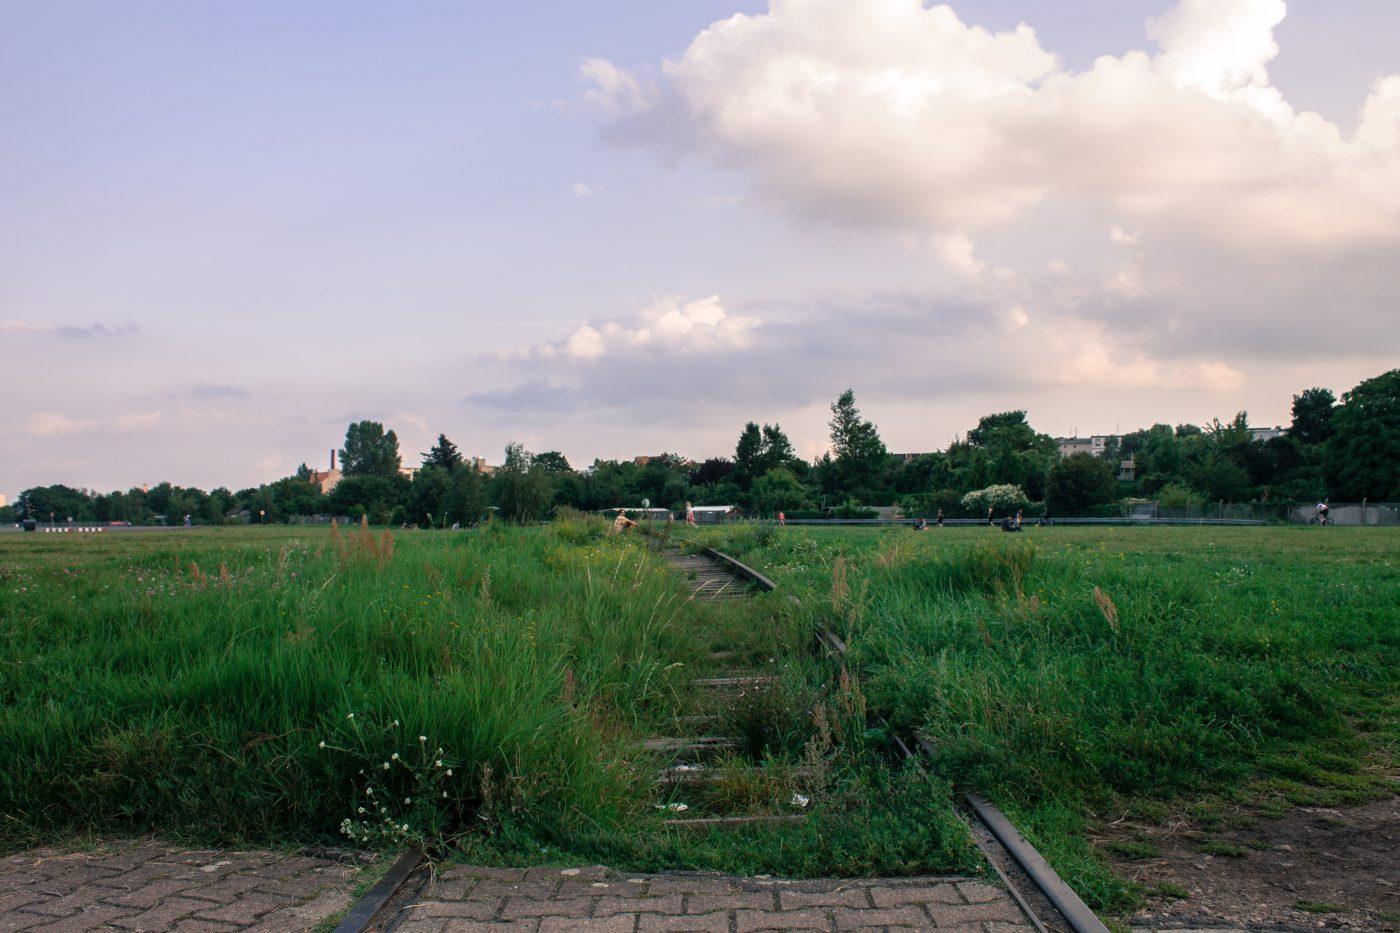 Tempelhofer Feld. Berlin, Germany Contributed by Sam from Alternative Travelers